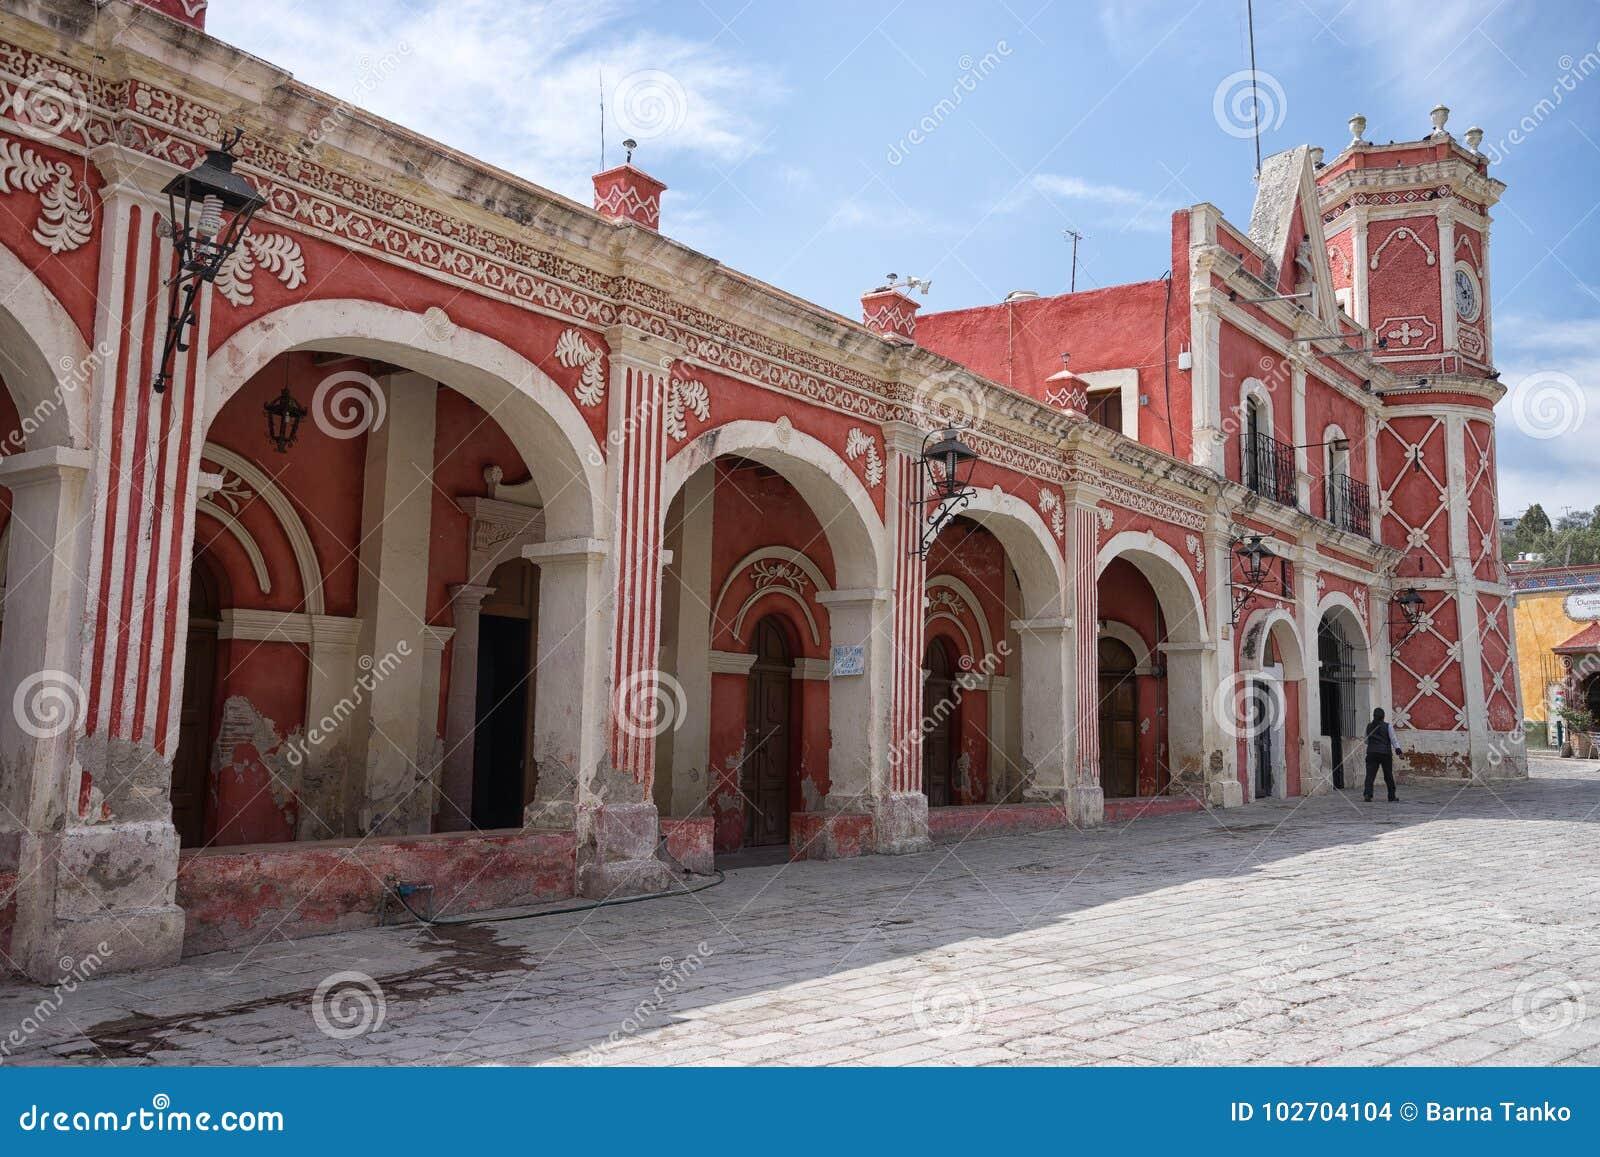 Colonial Architecture In Bernal Queretaro Mexico Editorial Stock